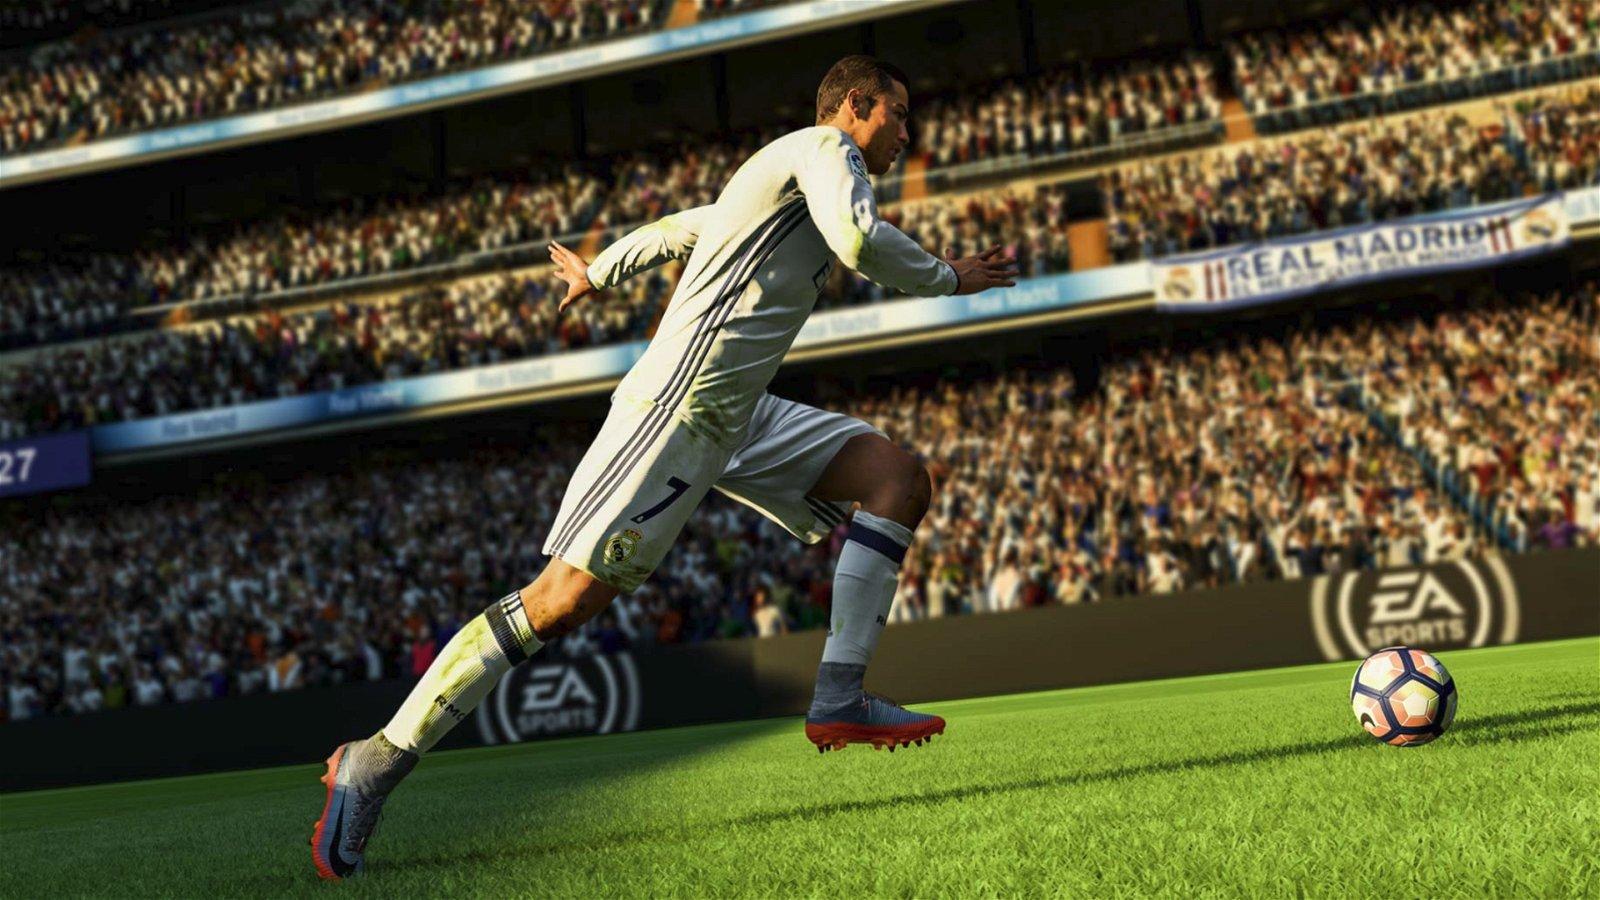 FIFA 18 (PlayStation 4) Review 7